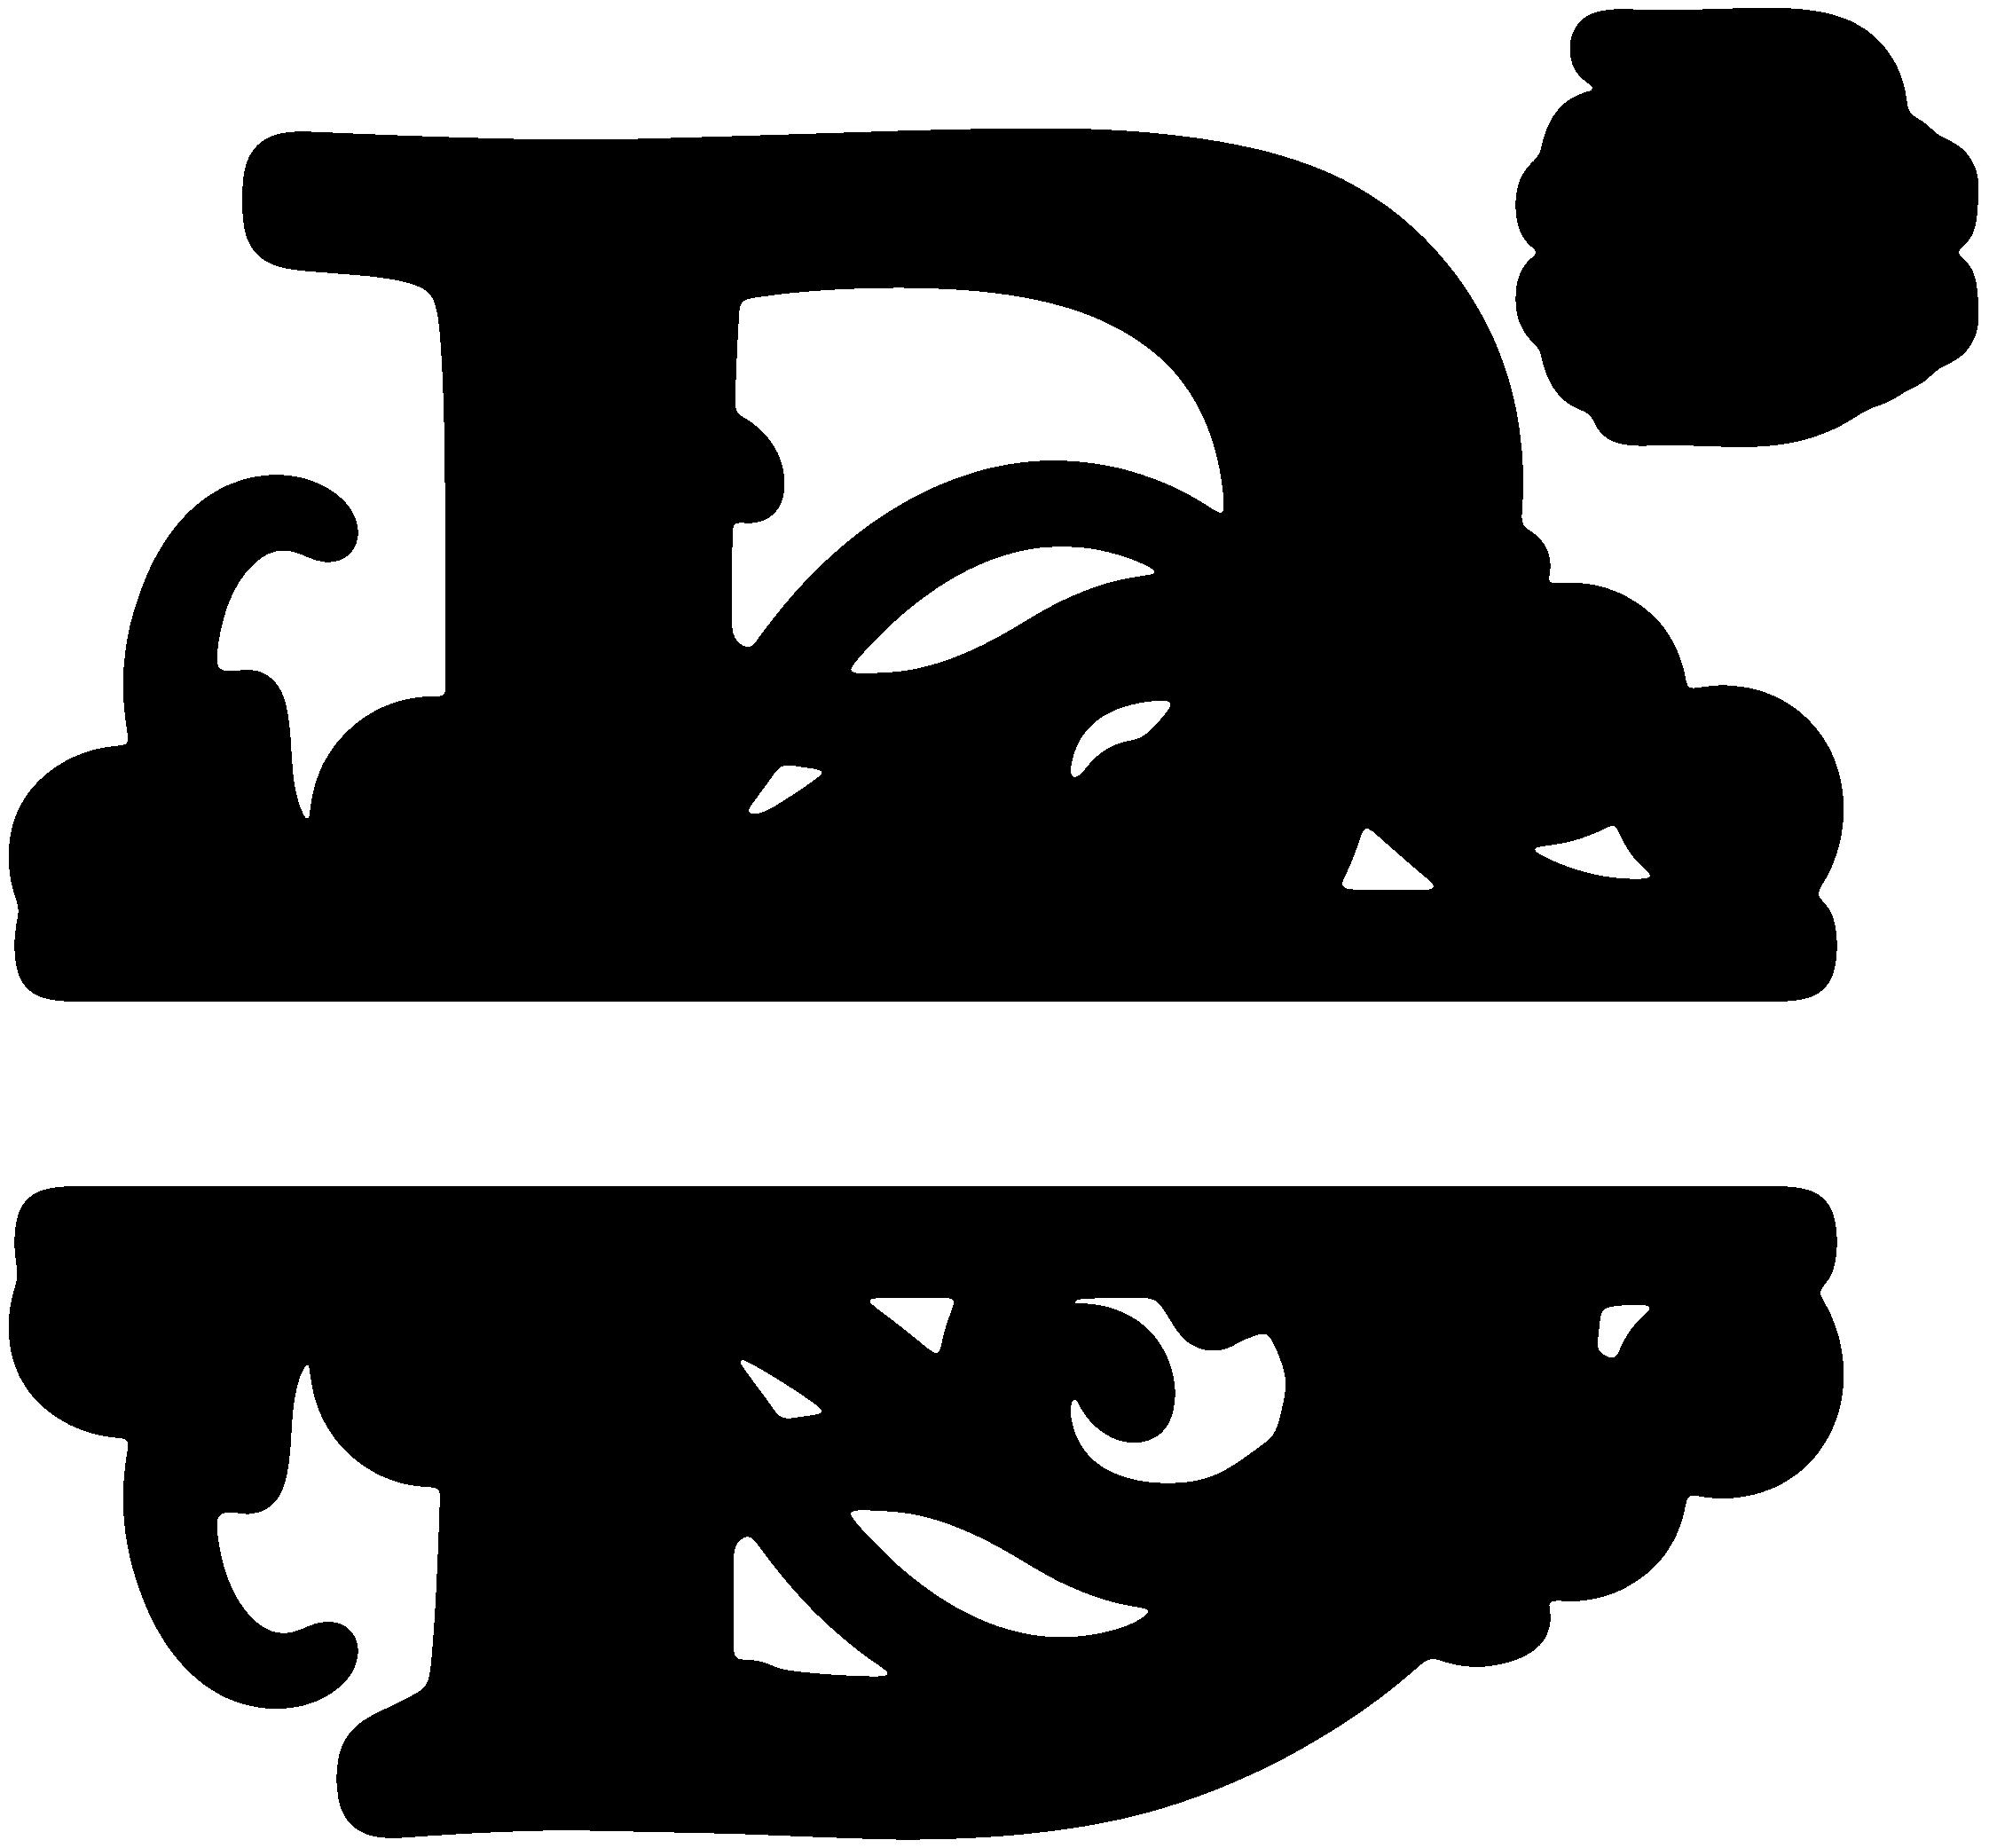 B split sds svgattic. Cross monogram clipart